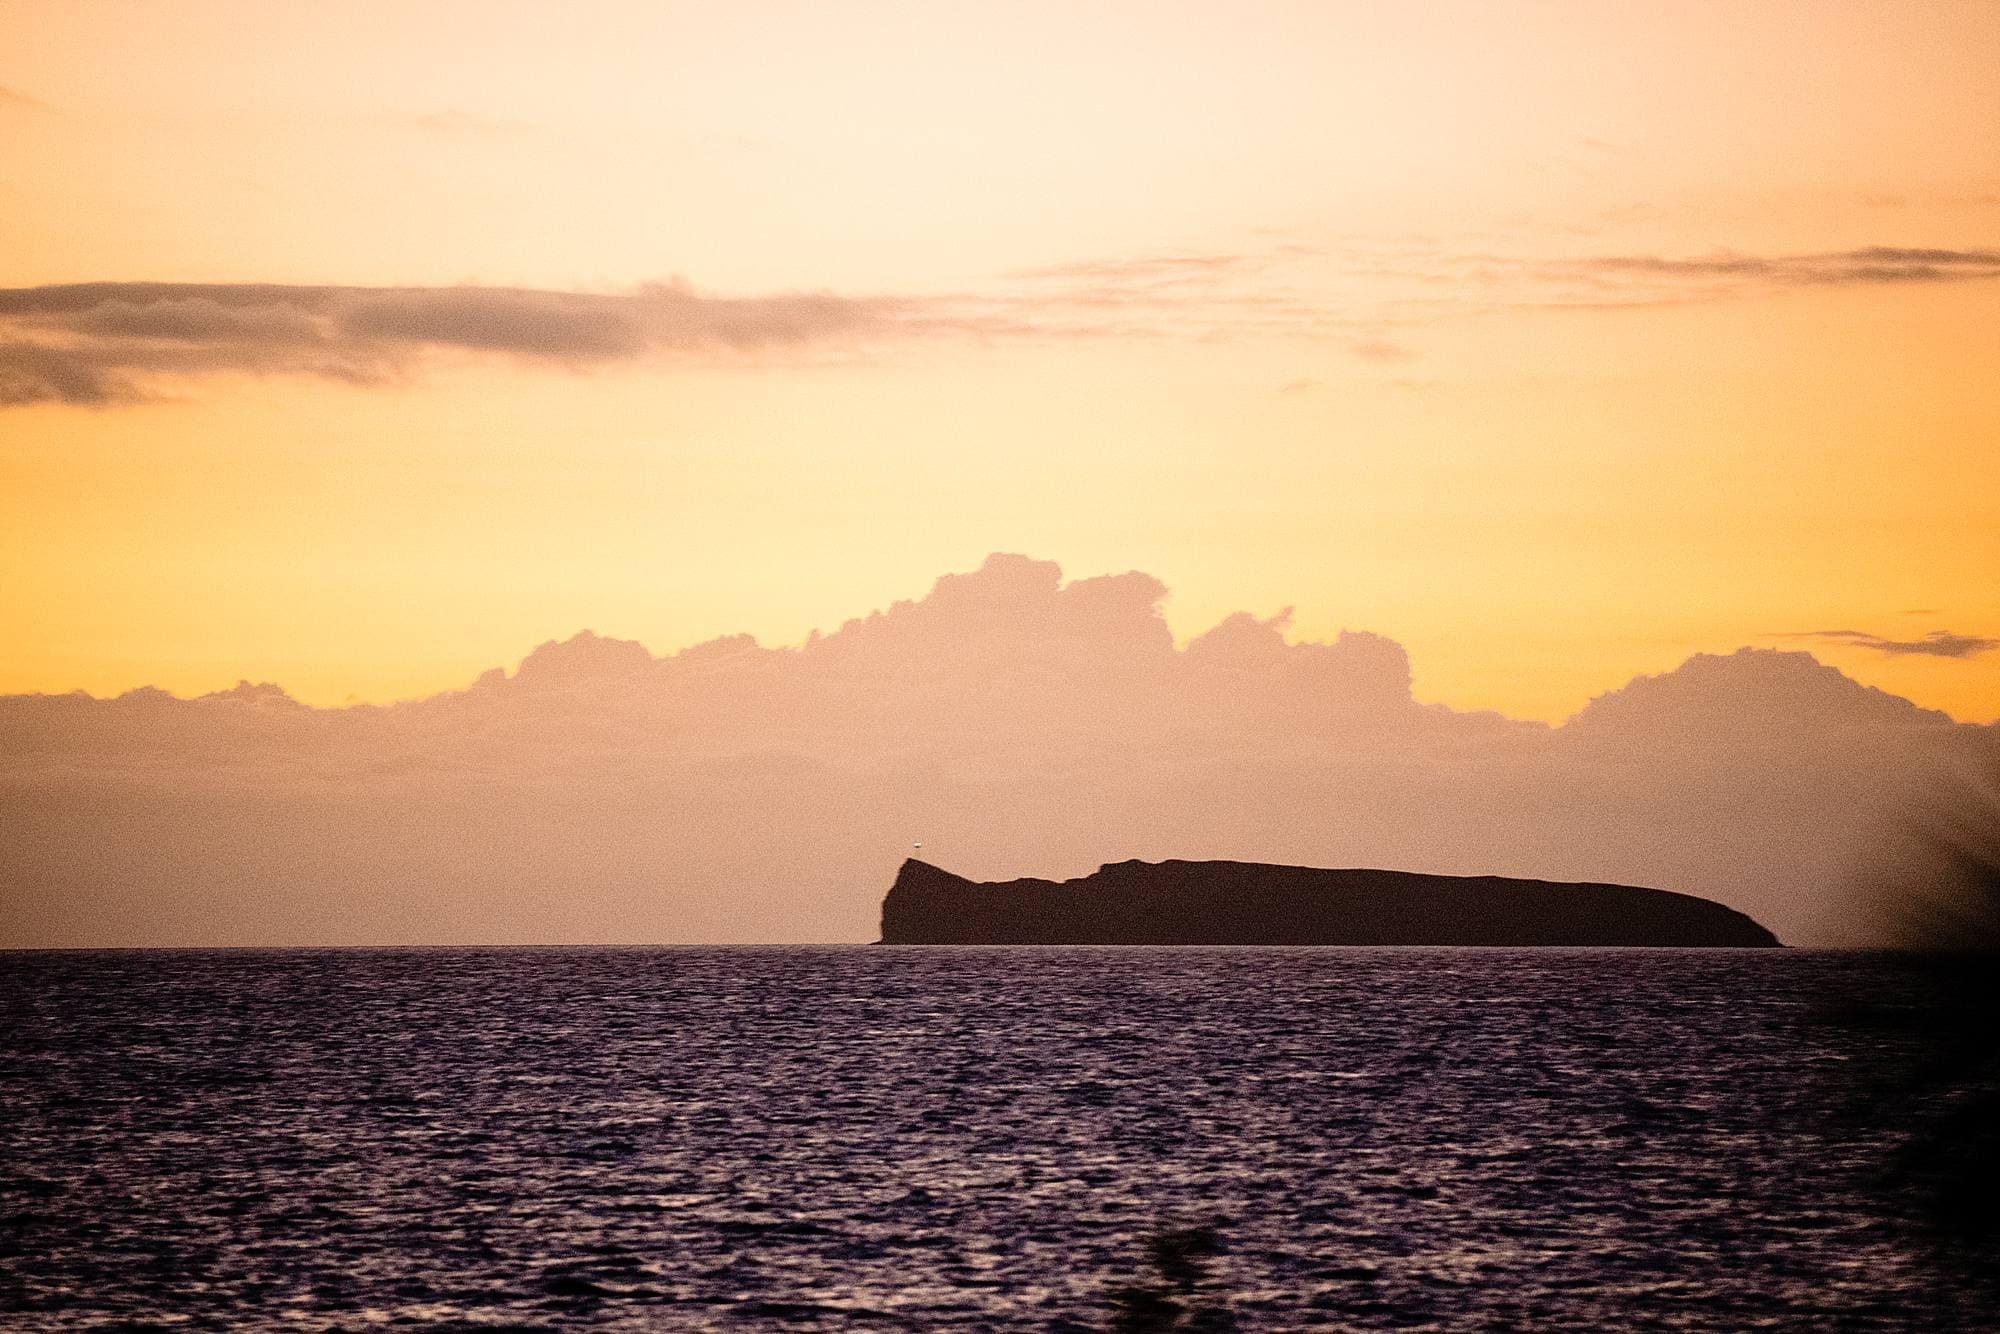 molokini sunset views from ponomakena sanctuary